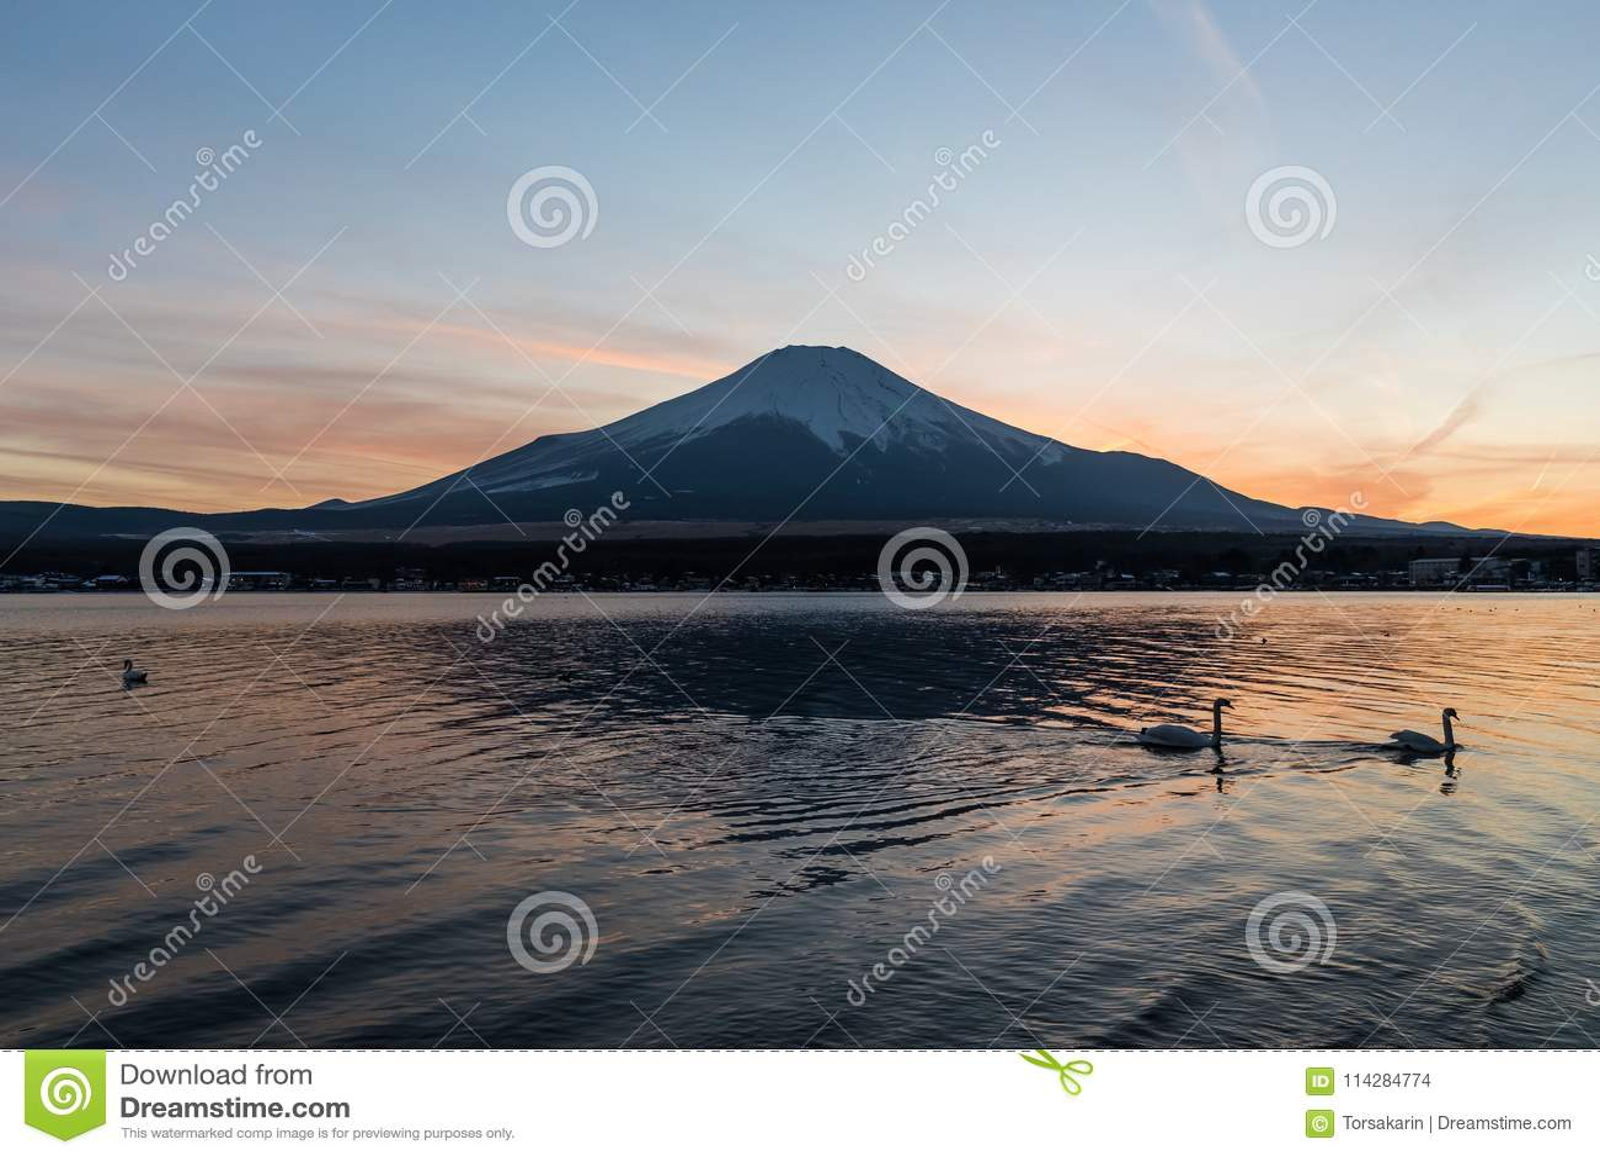 View of Mount Fuji and Lake Yamanakako